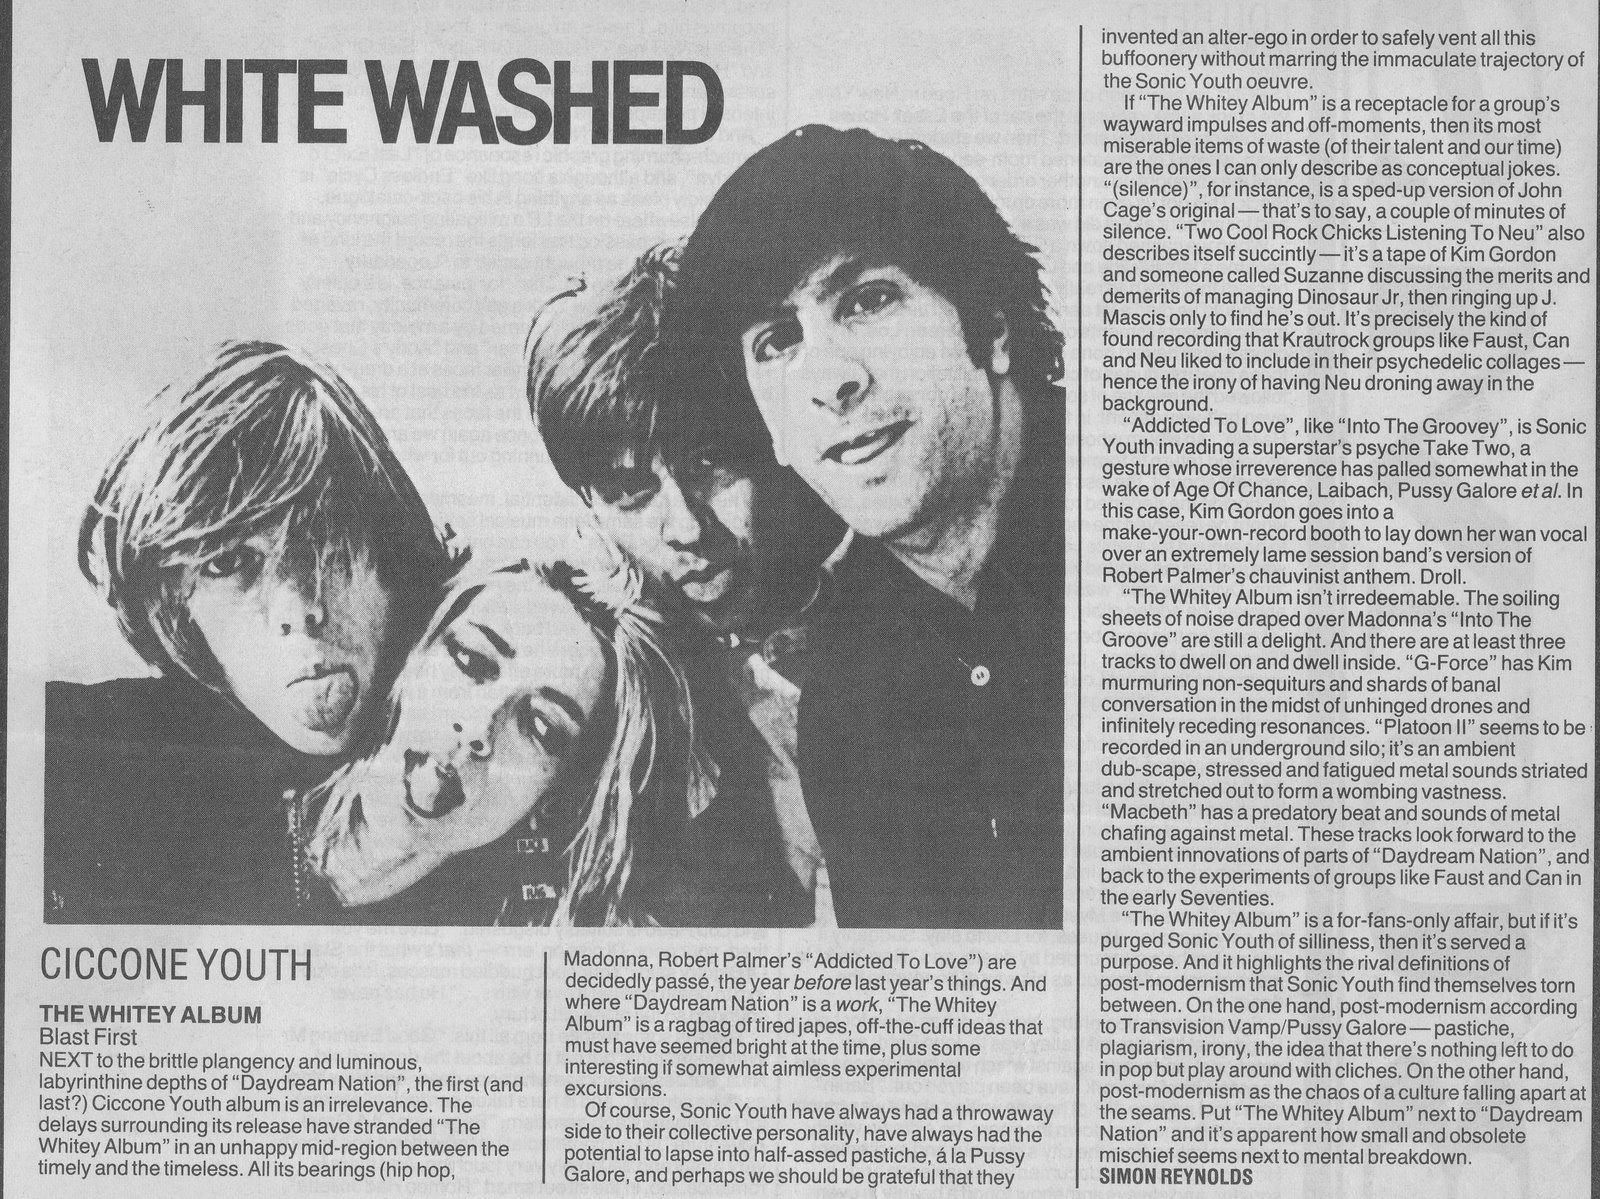 Ciccone Youth Lyrics, Music, News and Biography | MetroLyrics